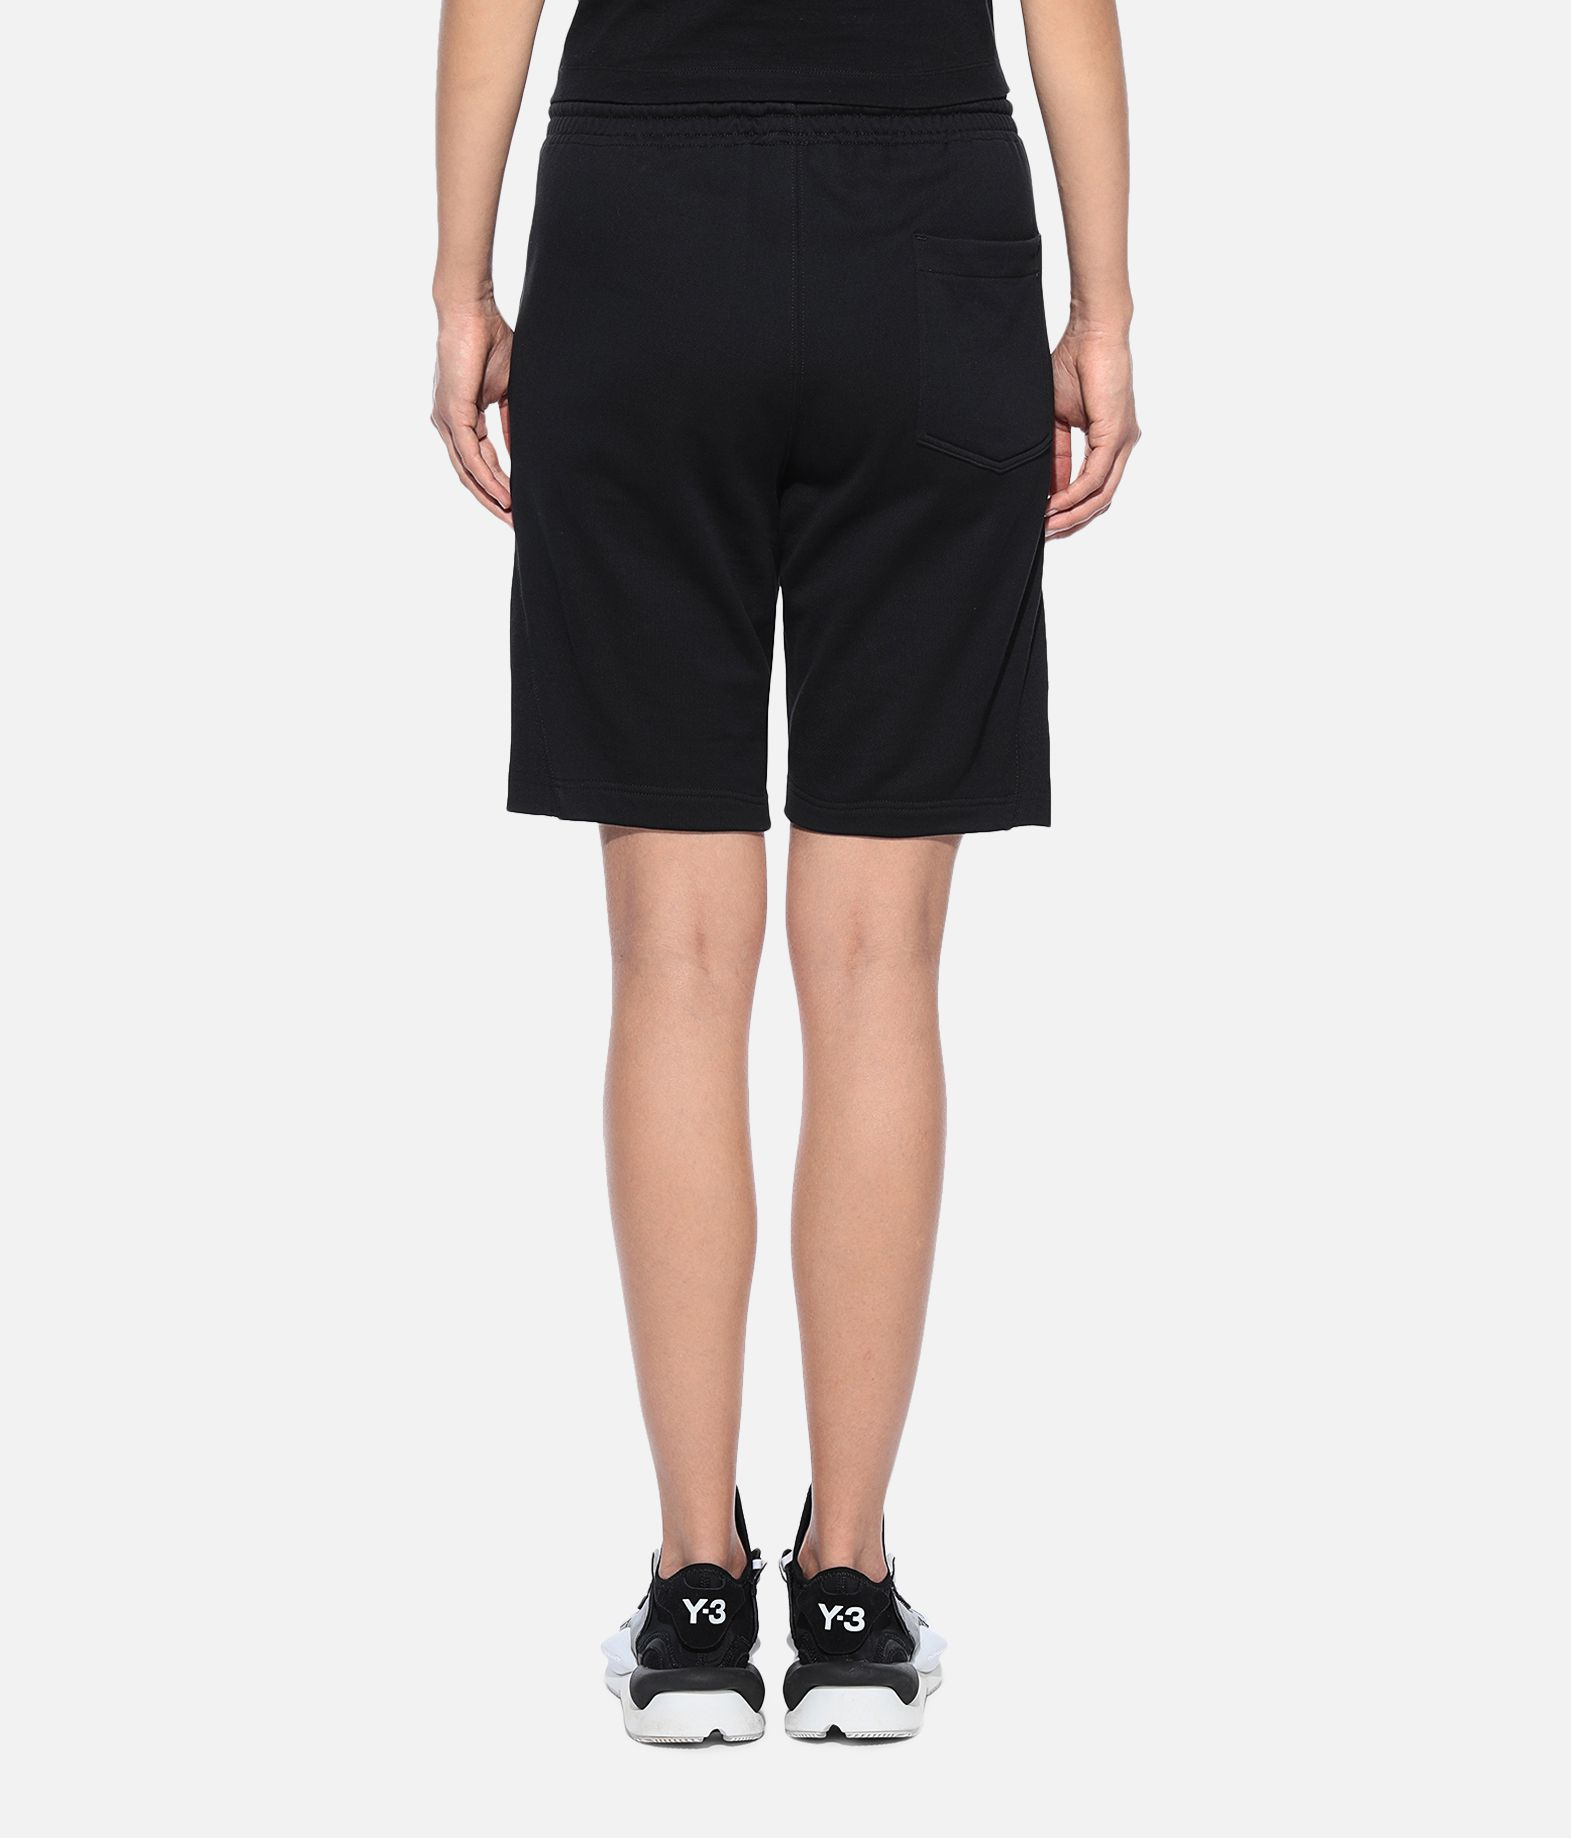 Y-3 Y-3 Classic Shorts Shorts Woman d